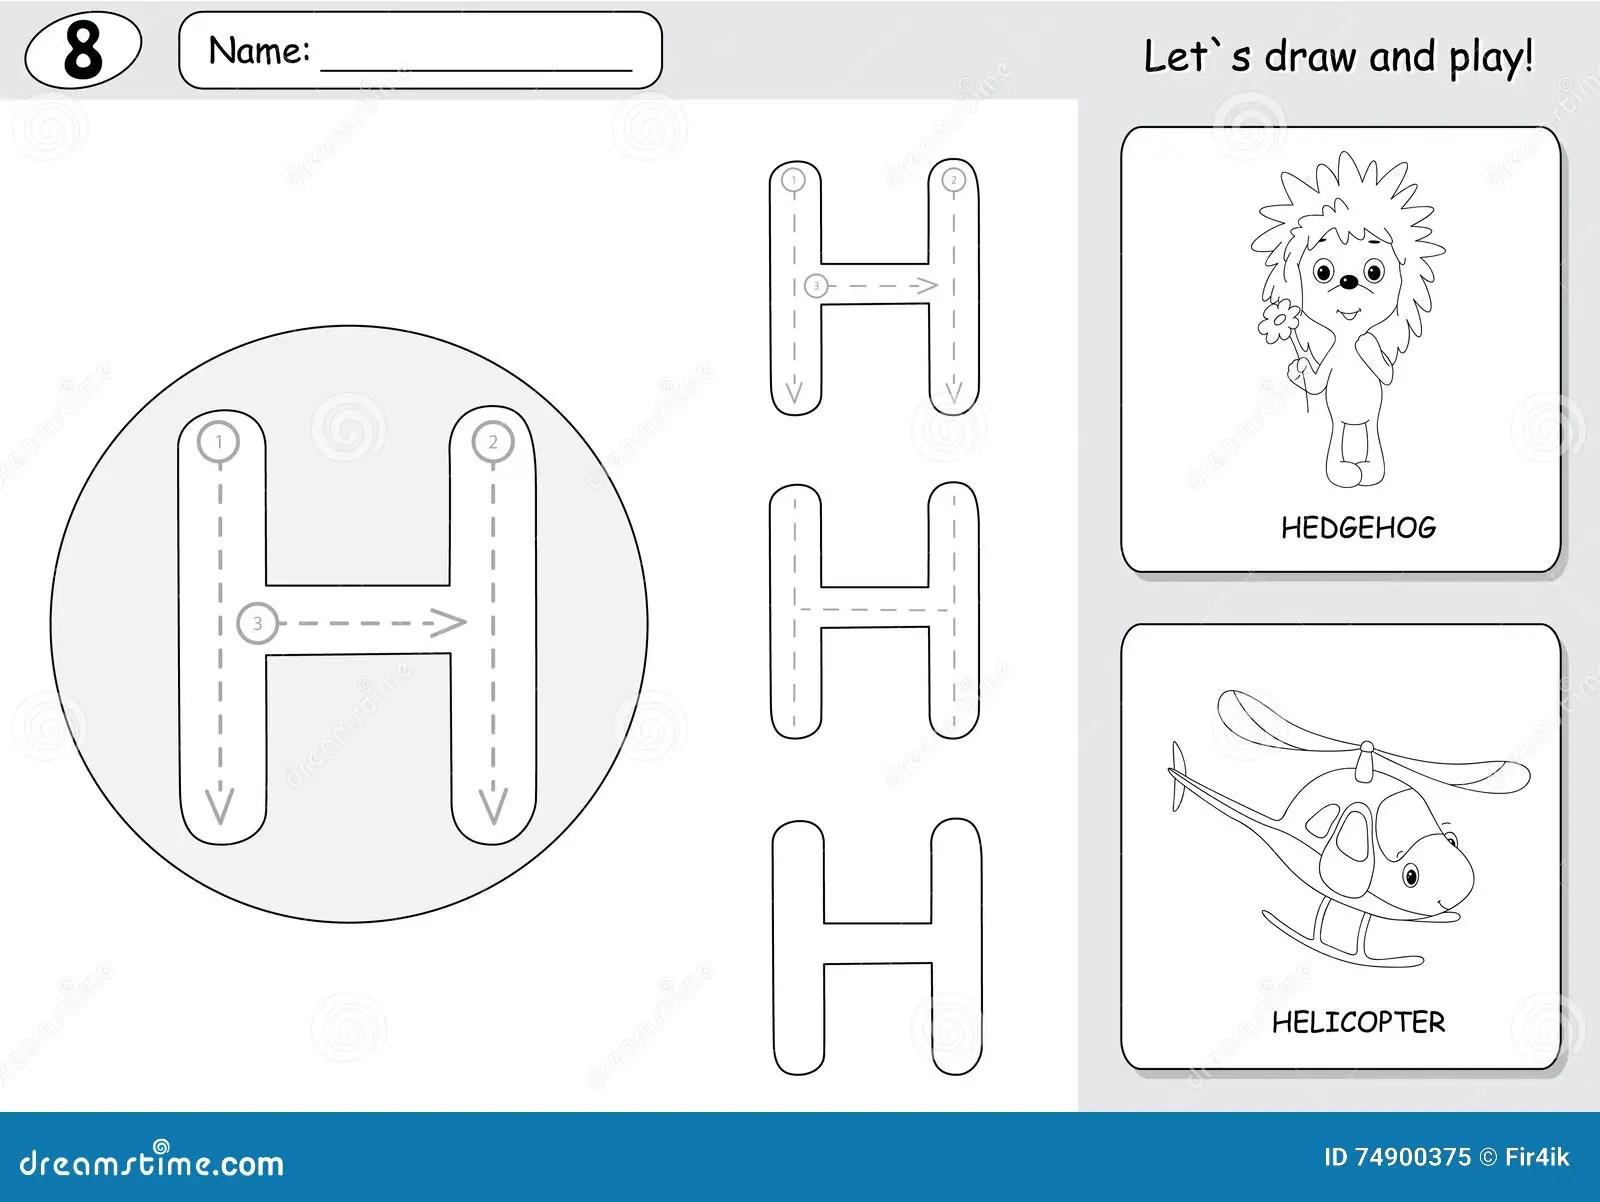 Cartoon Hedgehog And Helicopter Alphabet Tracing